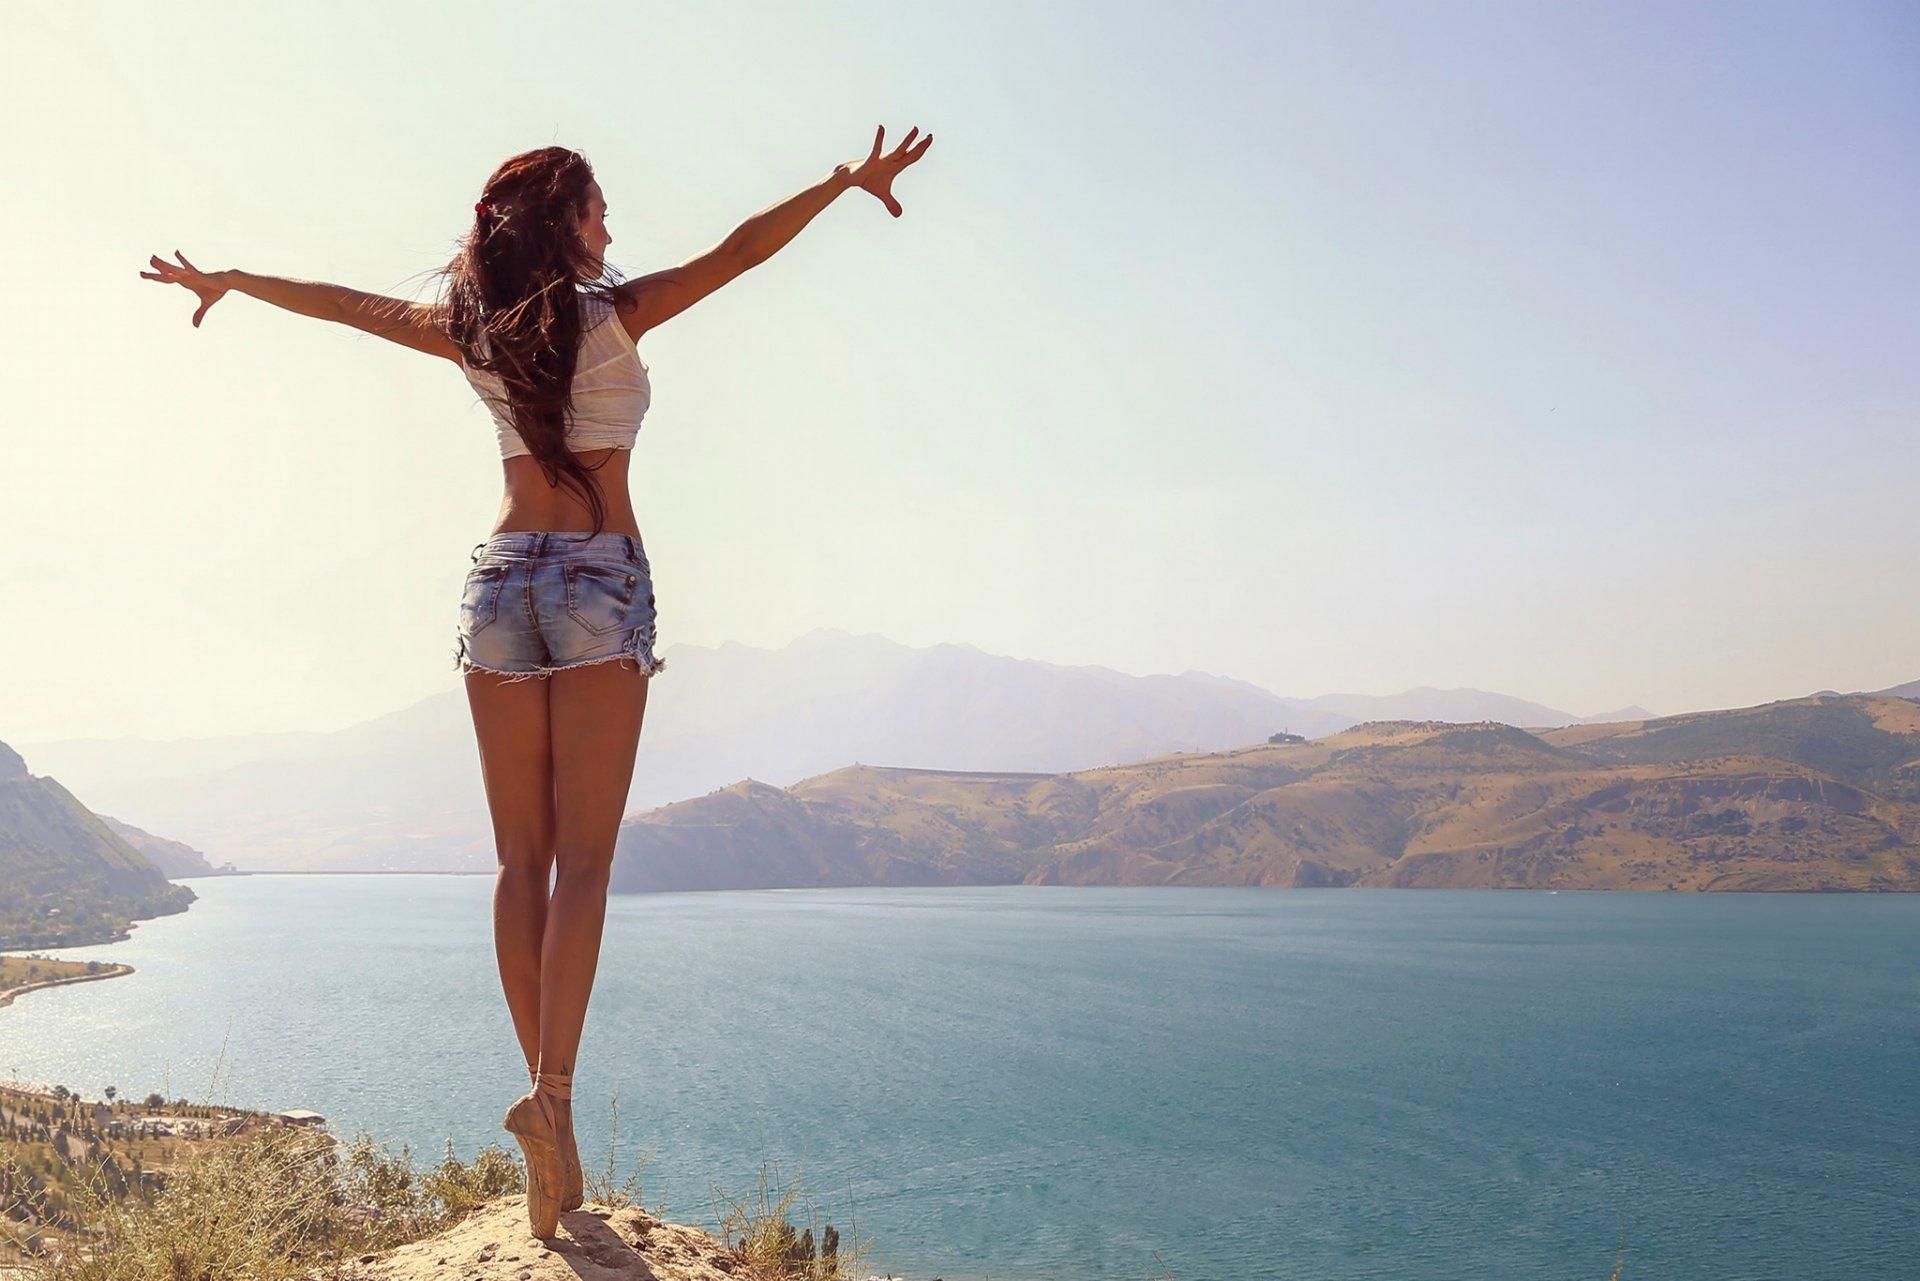 Красивая девушка на фоне красивого пейзажа